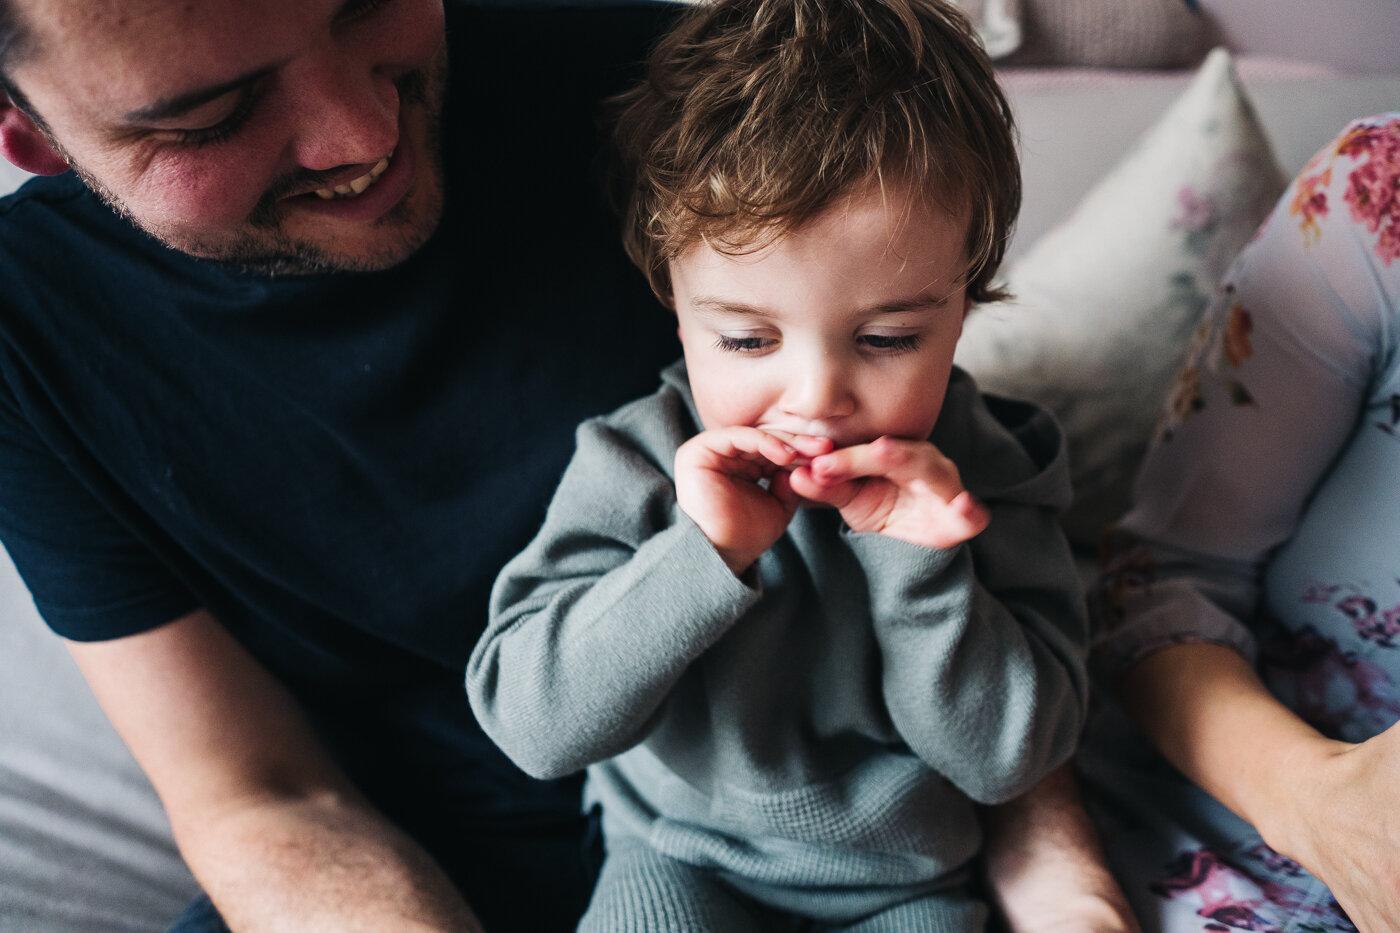 family-photography-teesside-north-yorkshire-newborn-baby-family-shoot-0004.jpg